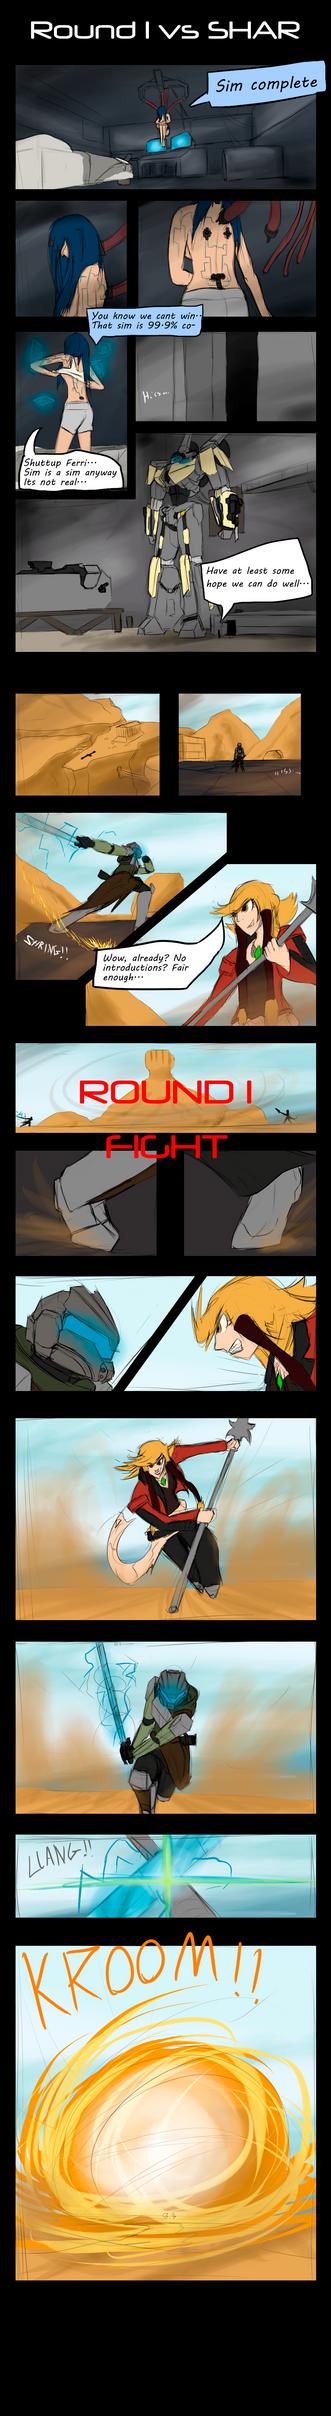 Fighting Tournament  Round 1-1: Shar